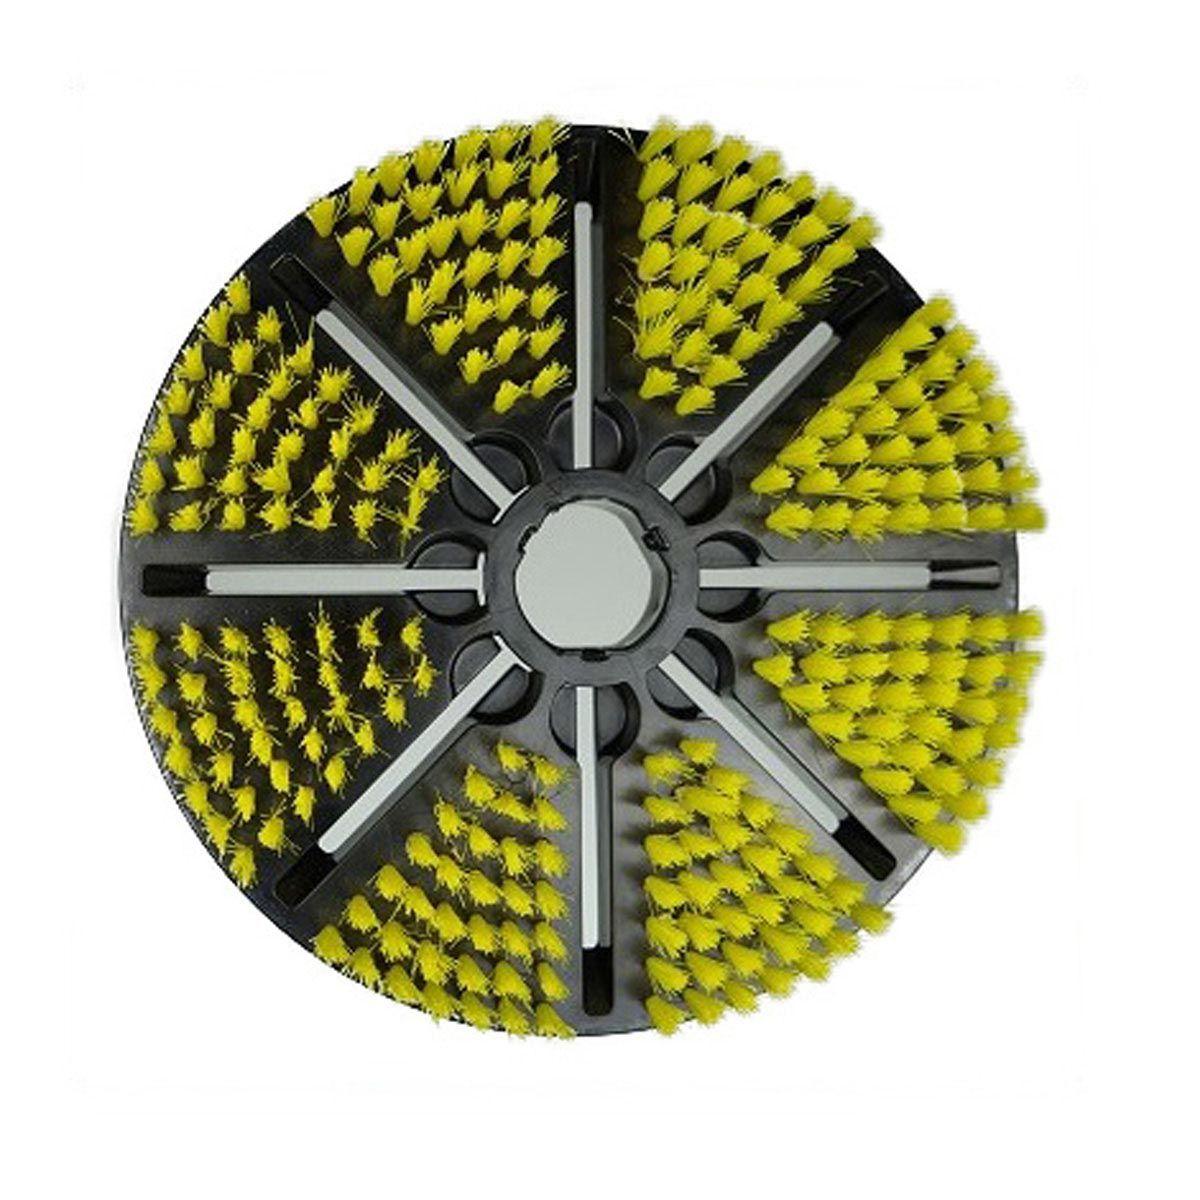 Vacugrip-Bürste zu Biber 22, gelb, weich, D 250 mm